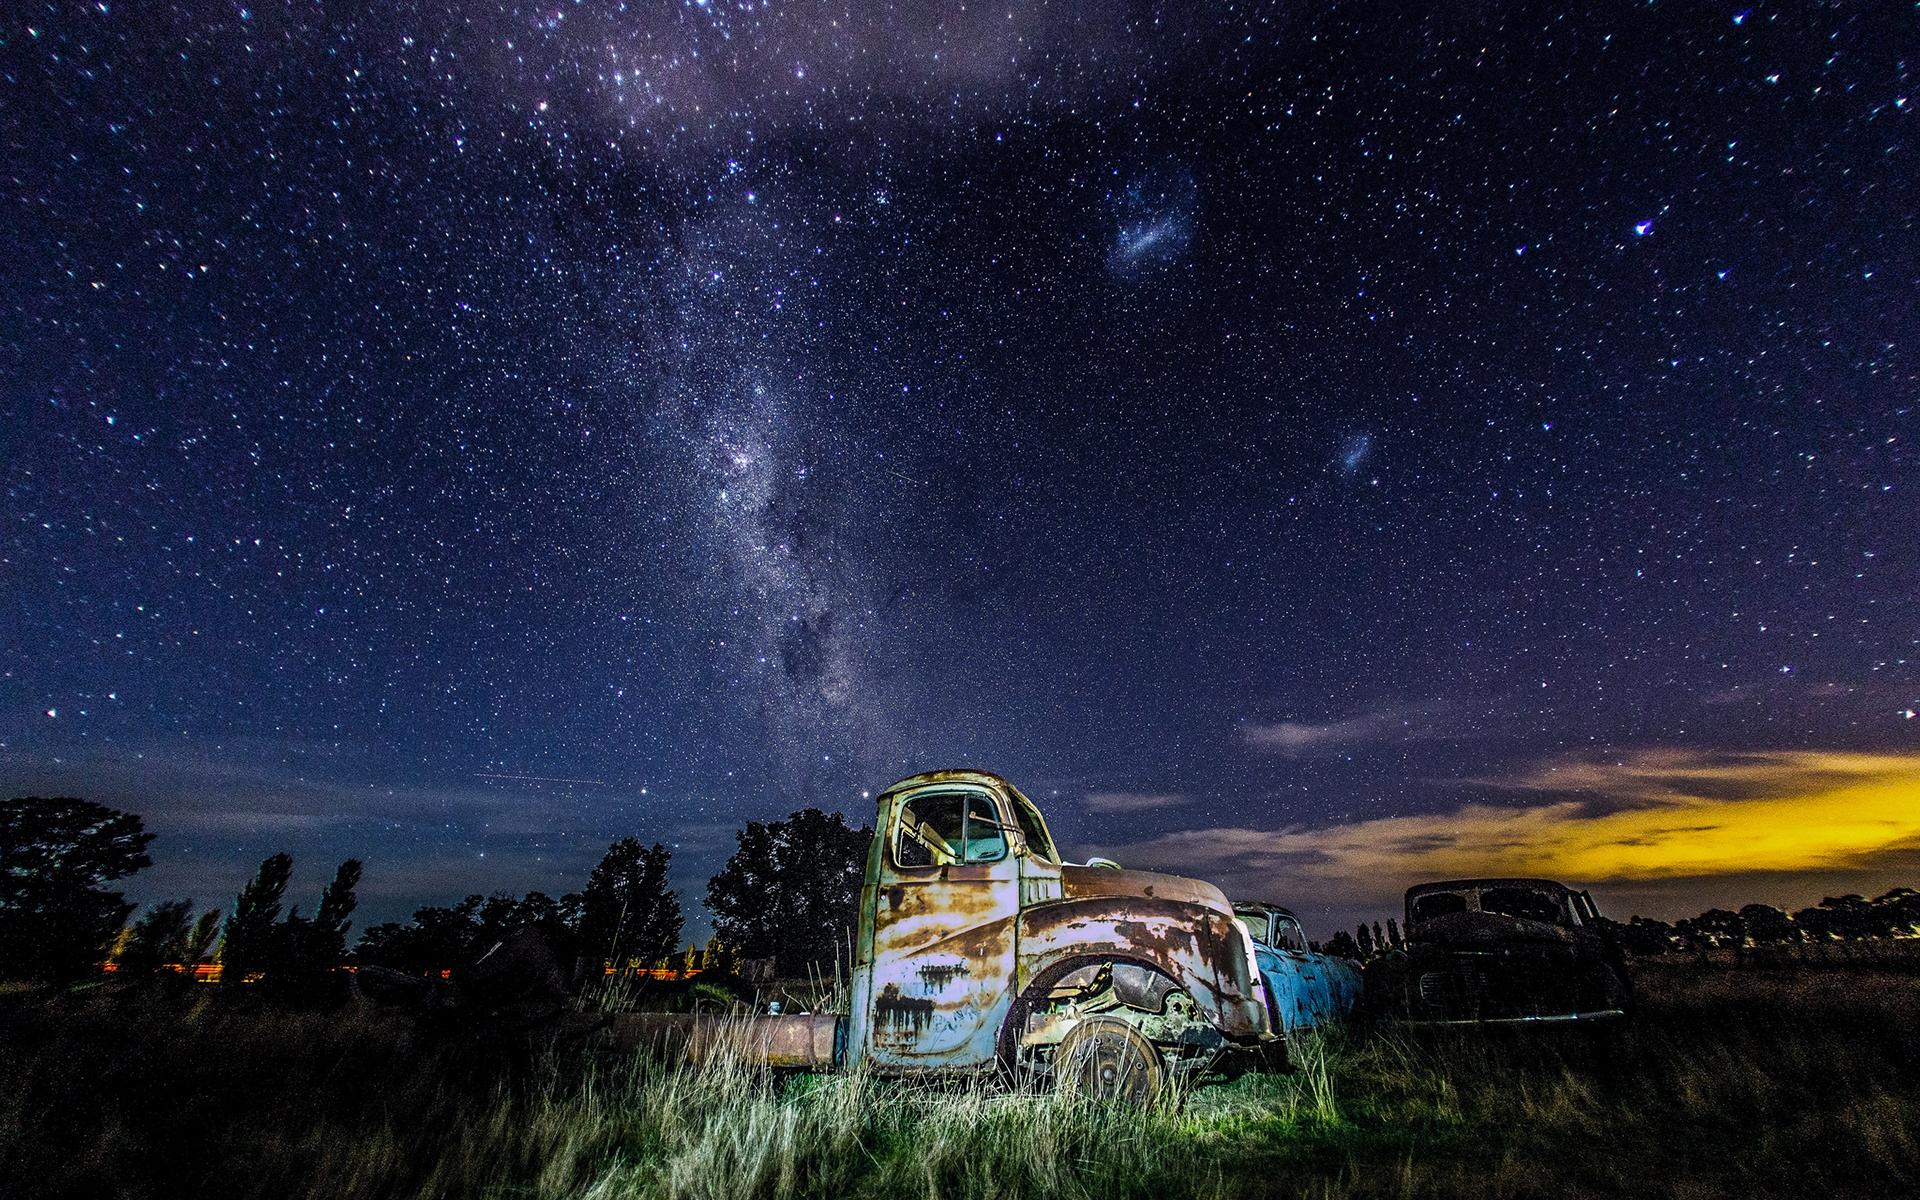 denser in middle night sky milky way galaxy - photo #26